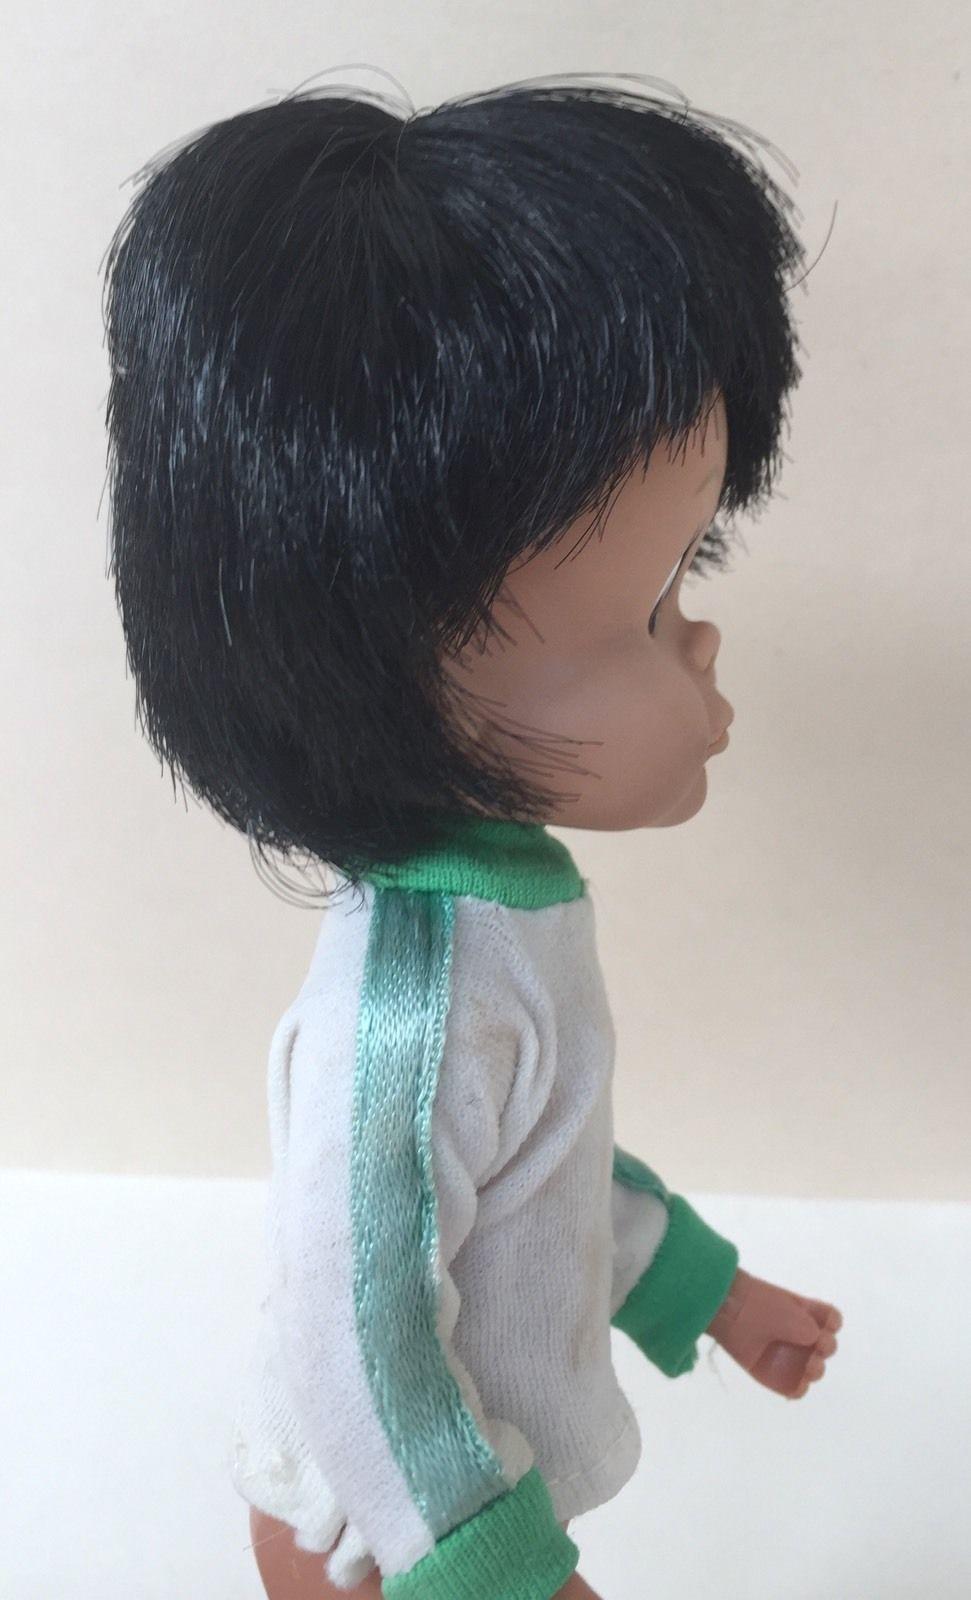 Sport Billy Rare Doll Figure 1980 Lyra Greece Olympics Vintage Toy | eBay